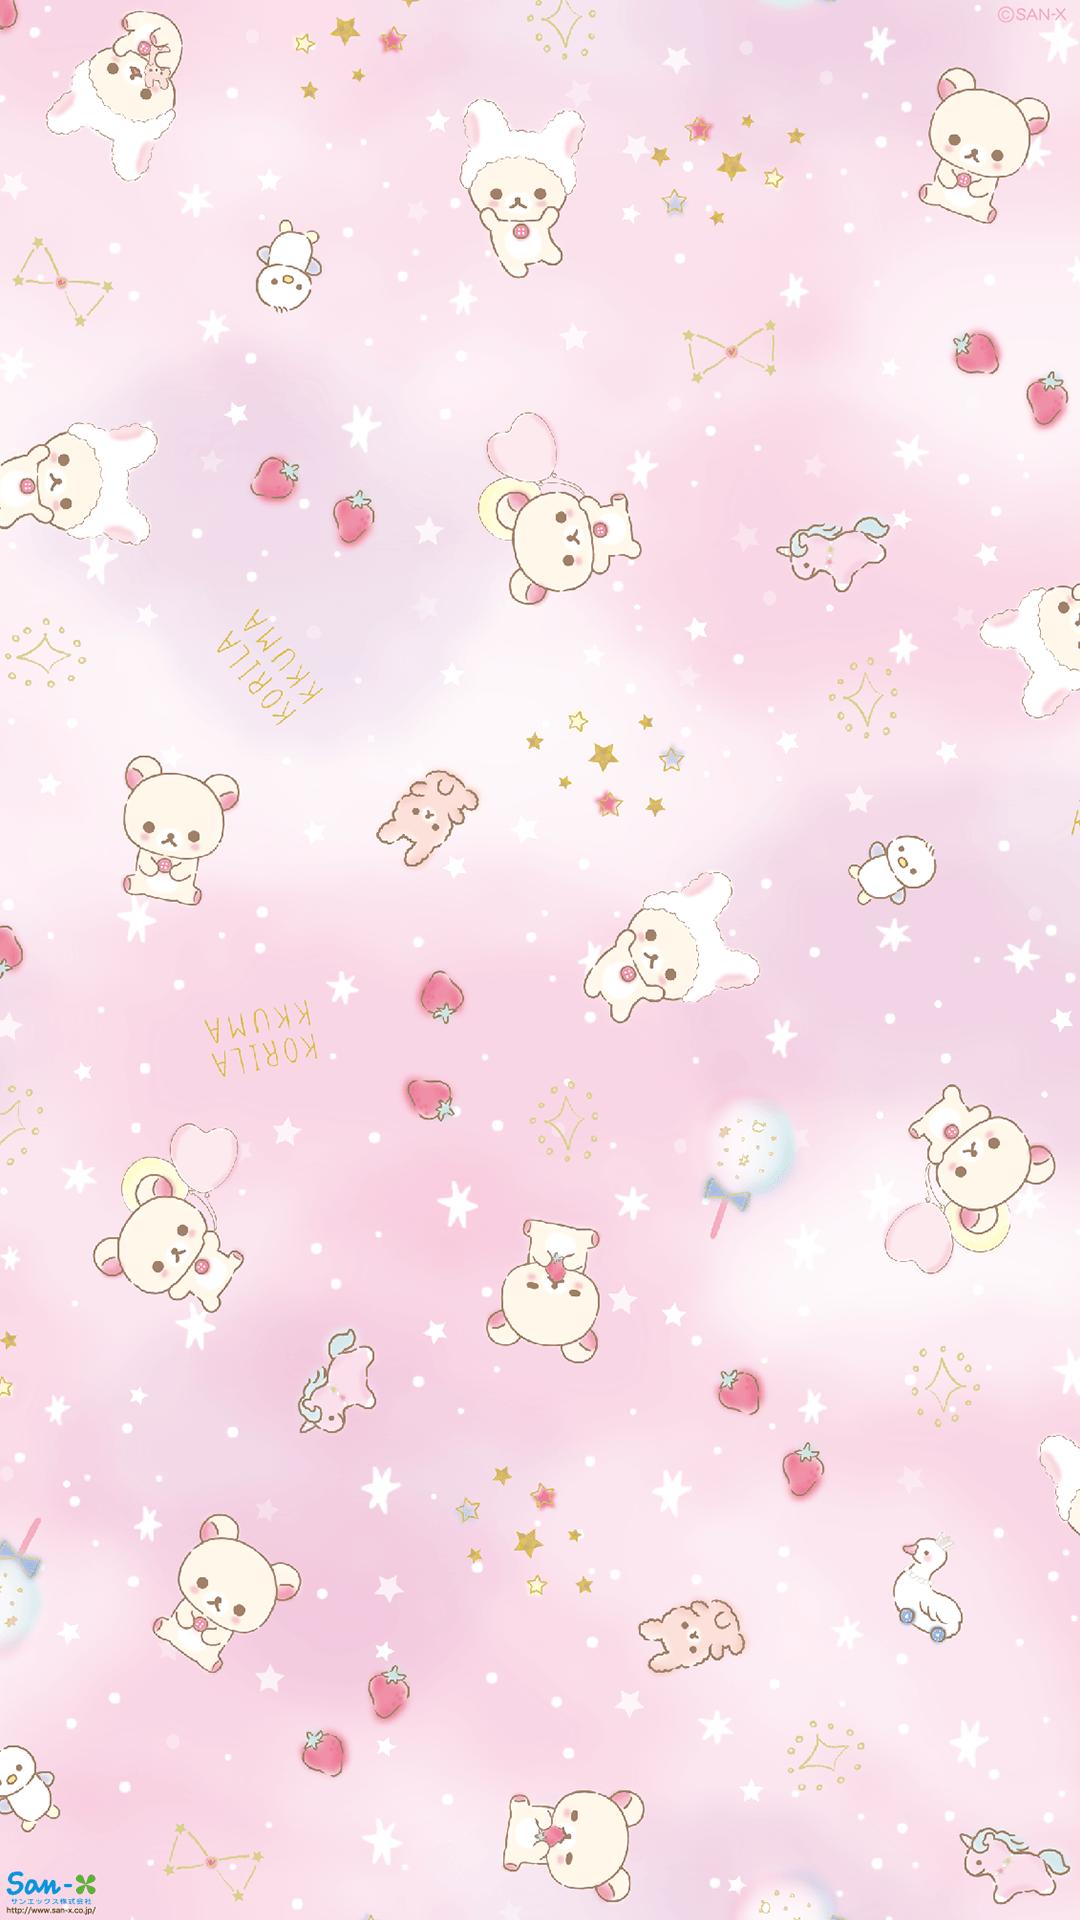 Unduh 98 Koleksi Background Rilakkuma Pink Gratis Terbaik